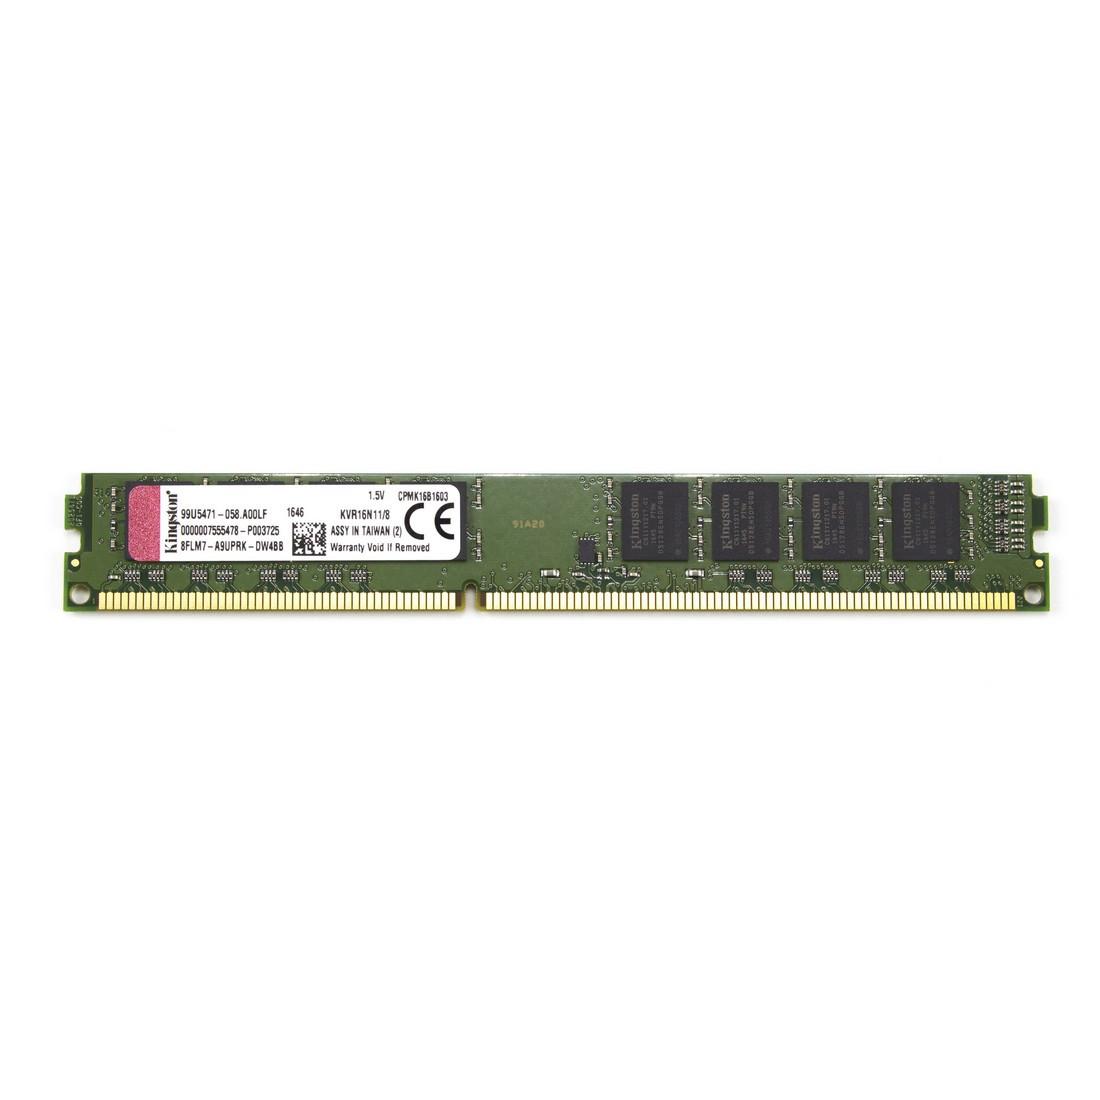 Модуль памяти Kingston DDR3 8 GB DIMM CL11 16 chip (KVR16N11/8)